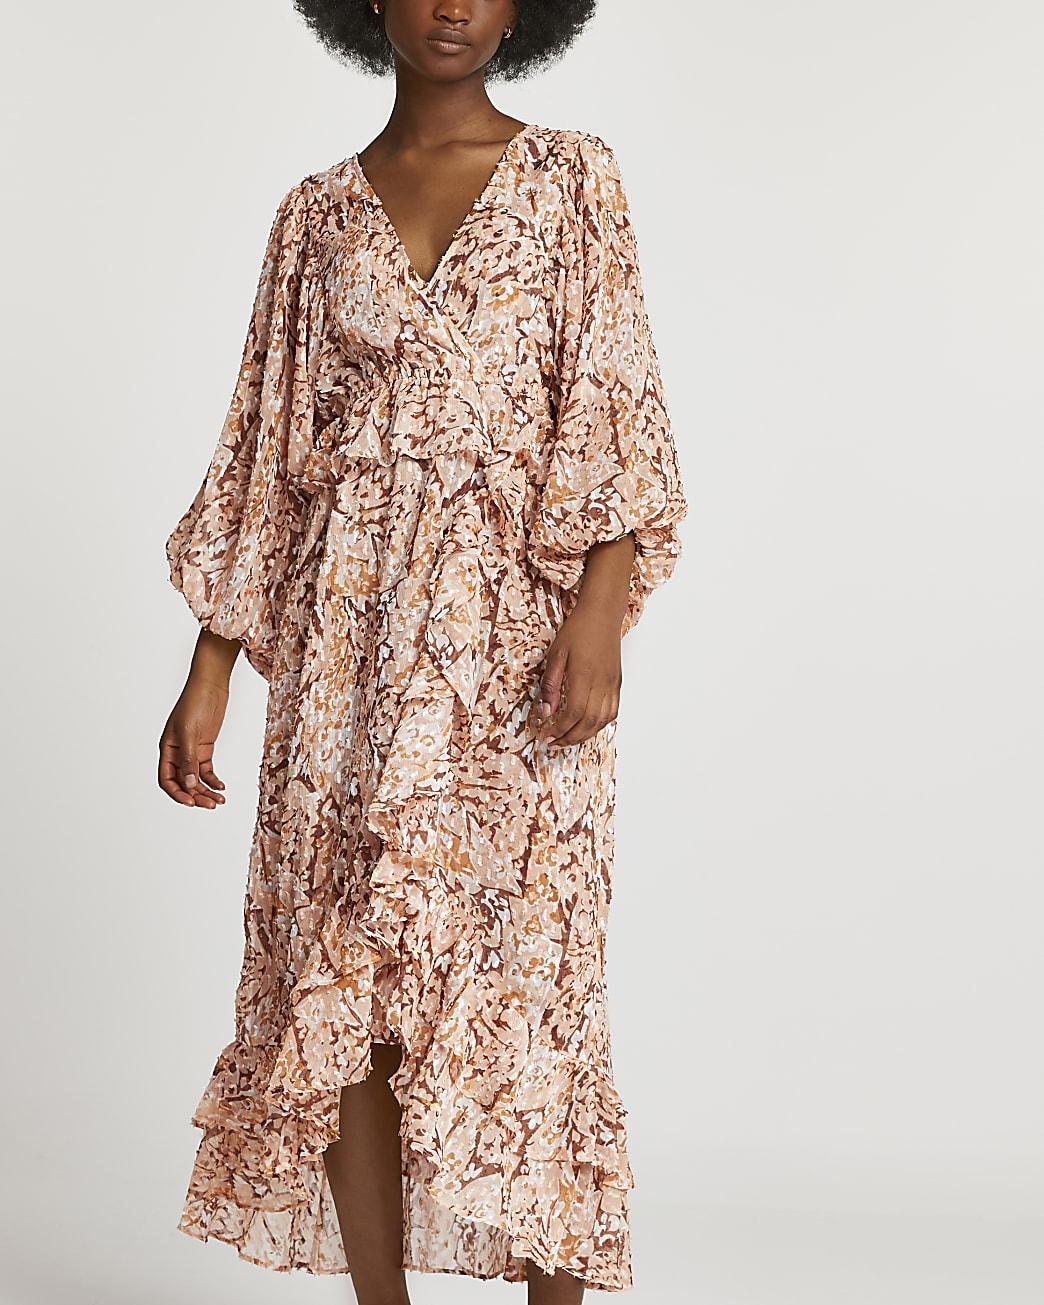 Brown animal print ruffled maxi dress